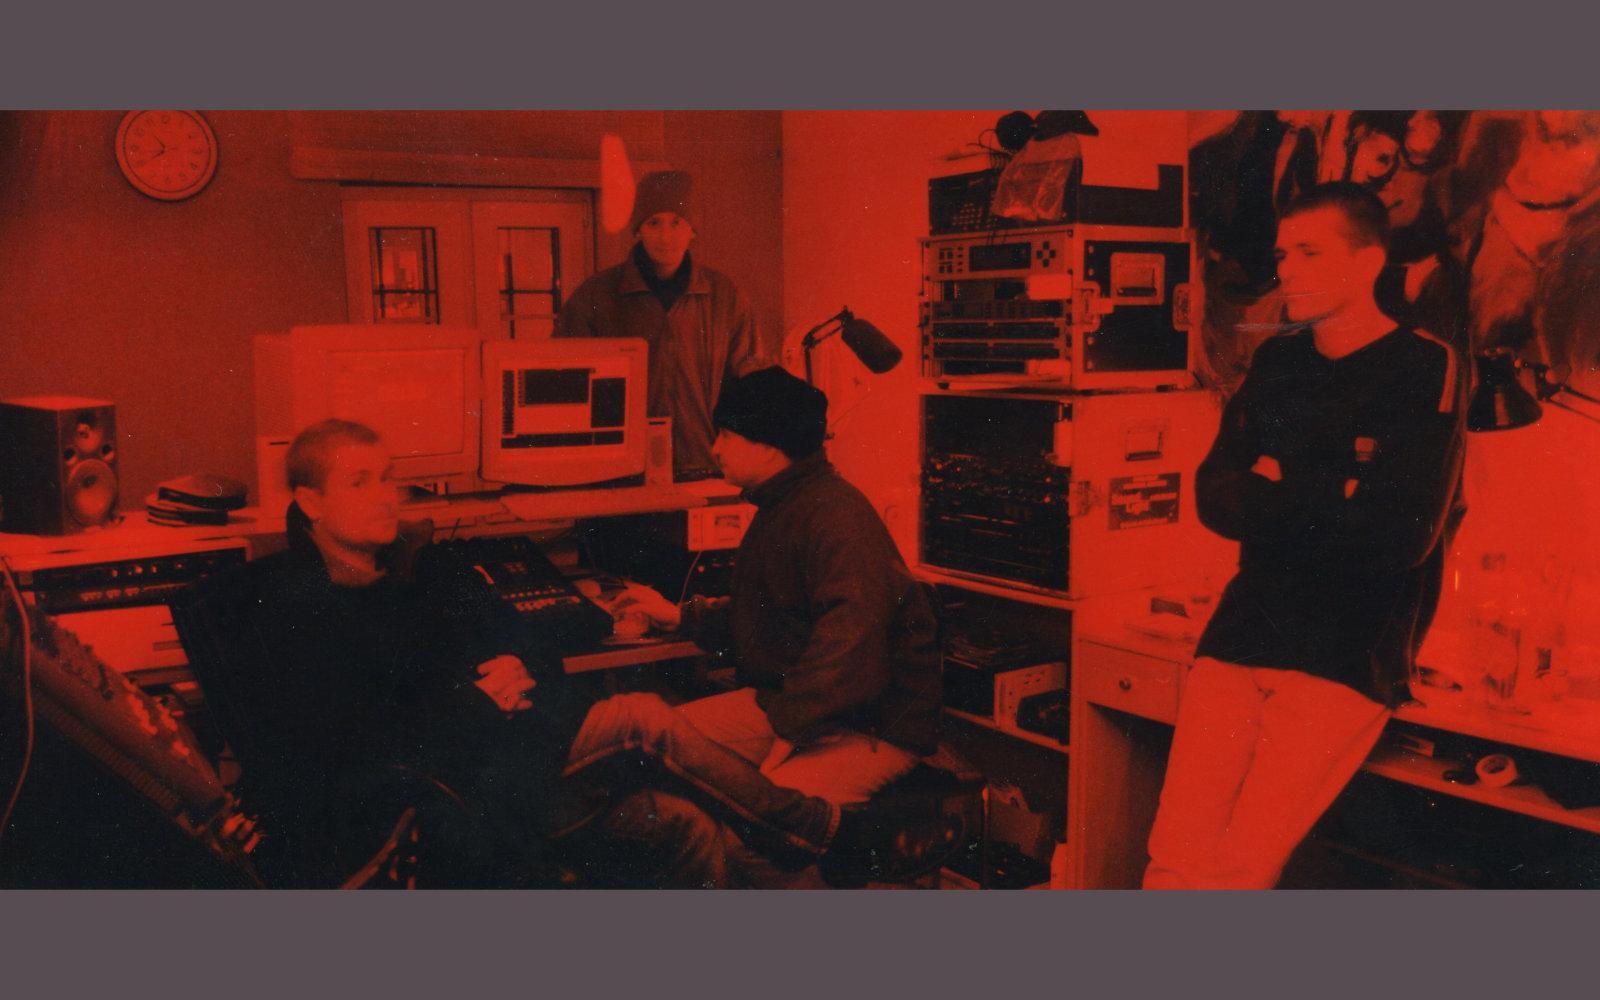 Zespół Variete w Studio Mózg, <strong>fot. Wojciech Woźniak</strong>